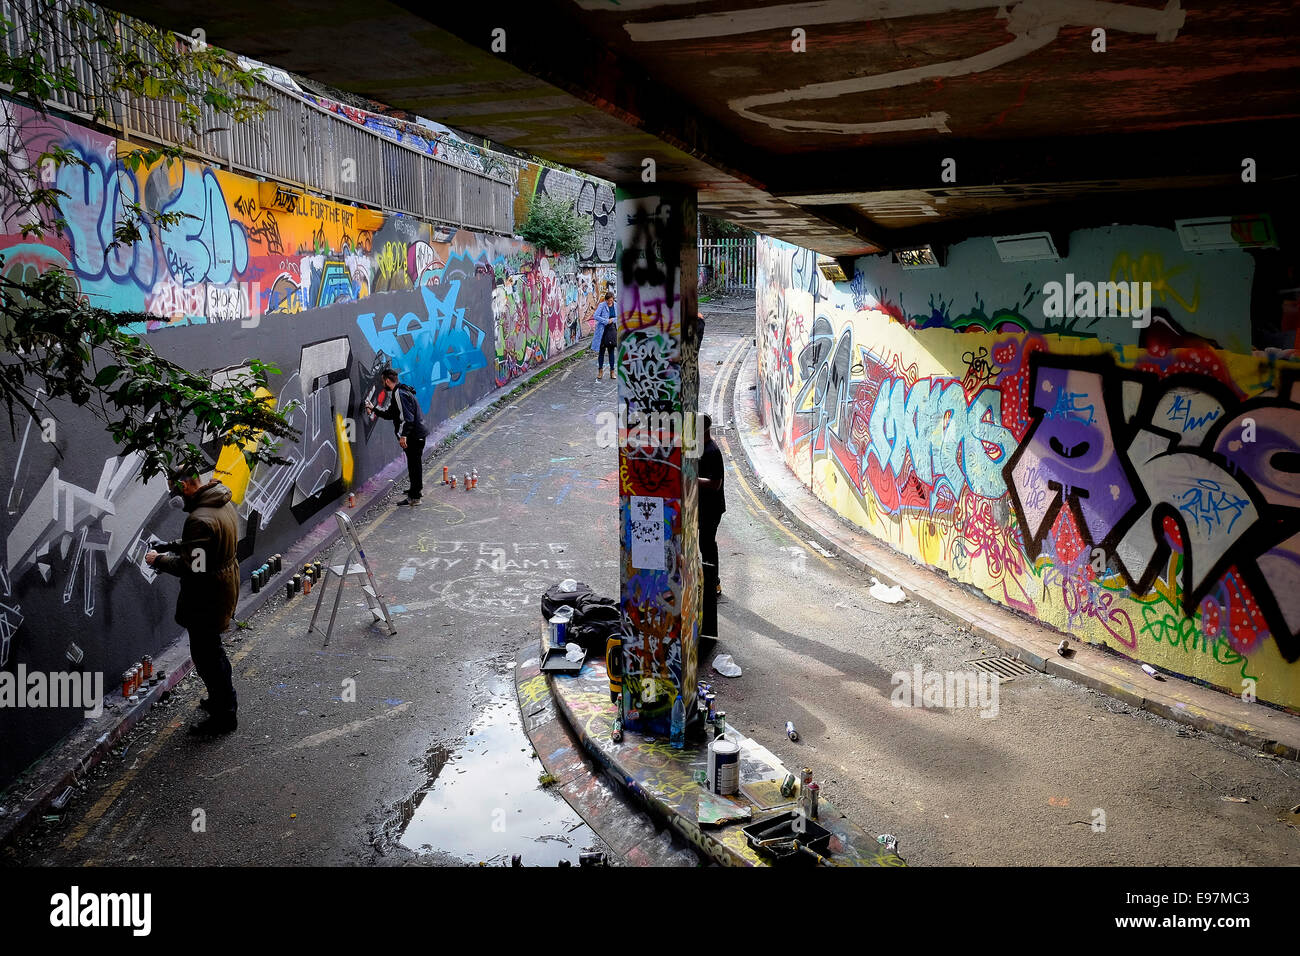 Graffiti artists decorating a wall in Leake Street in Waterloo. - Stock Image